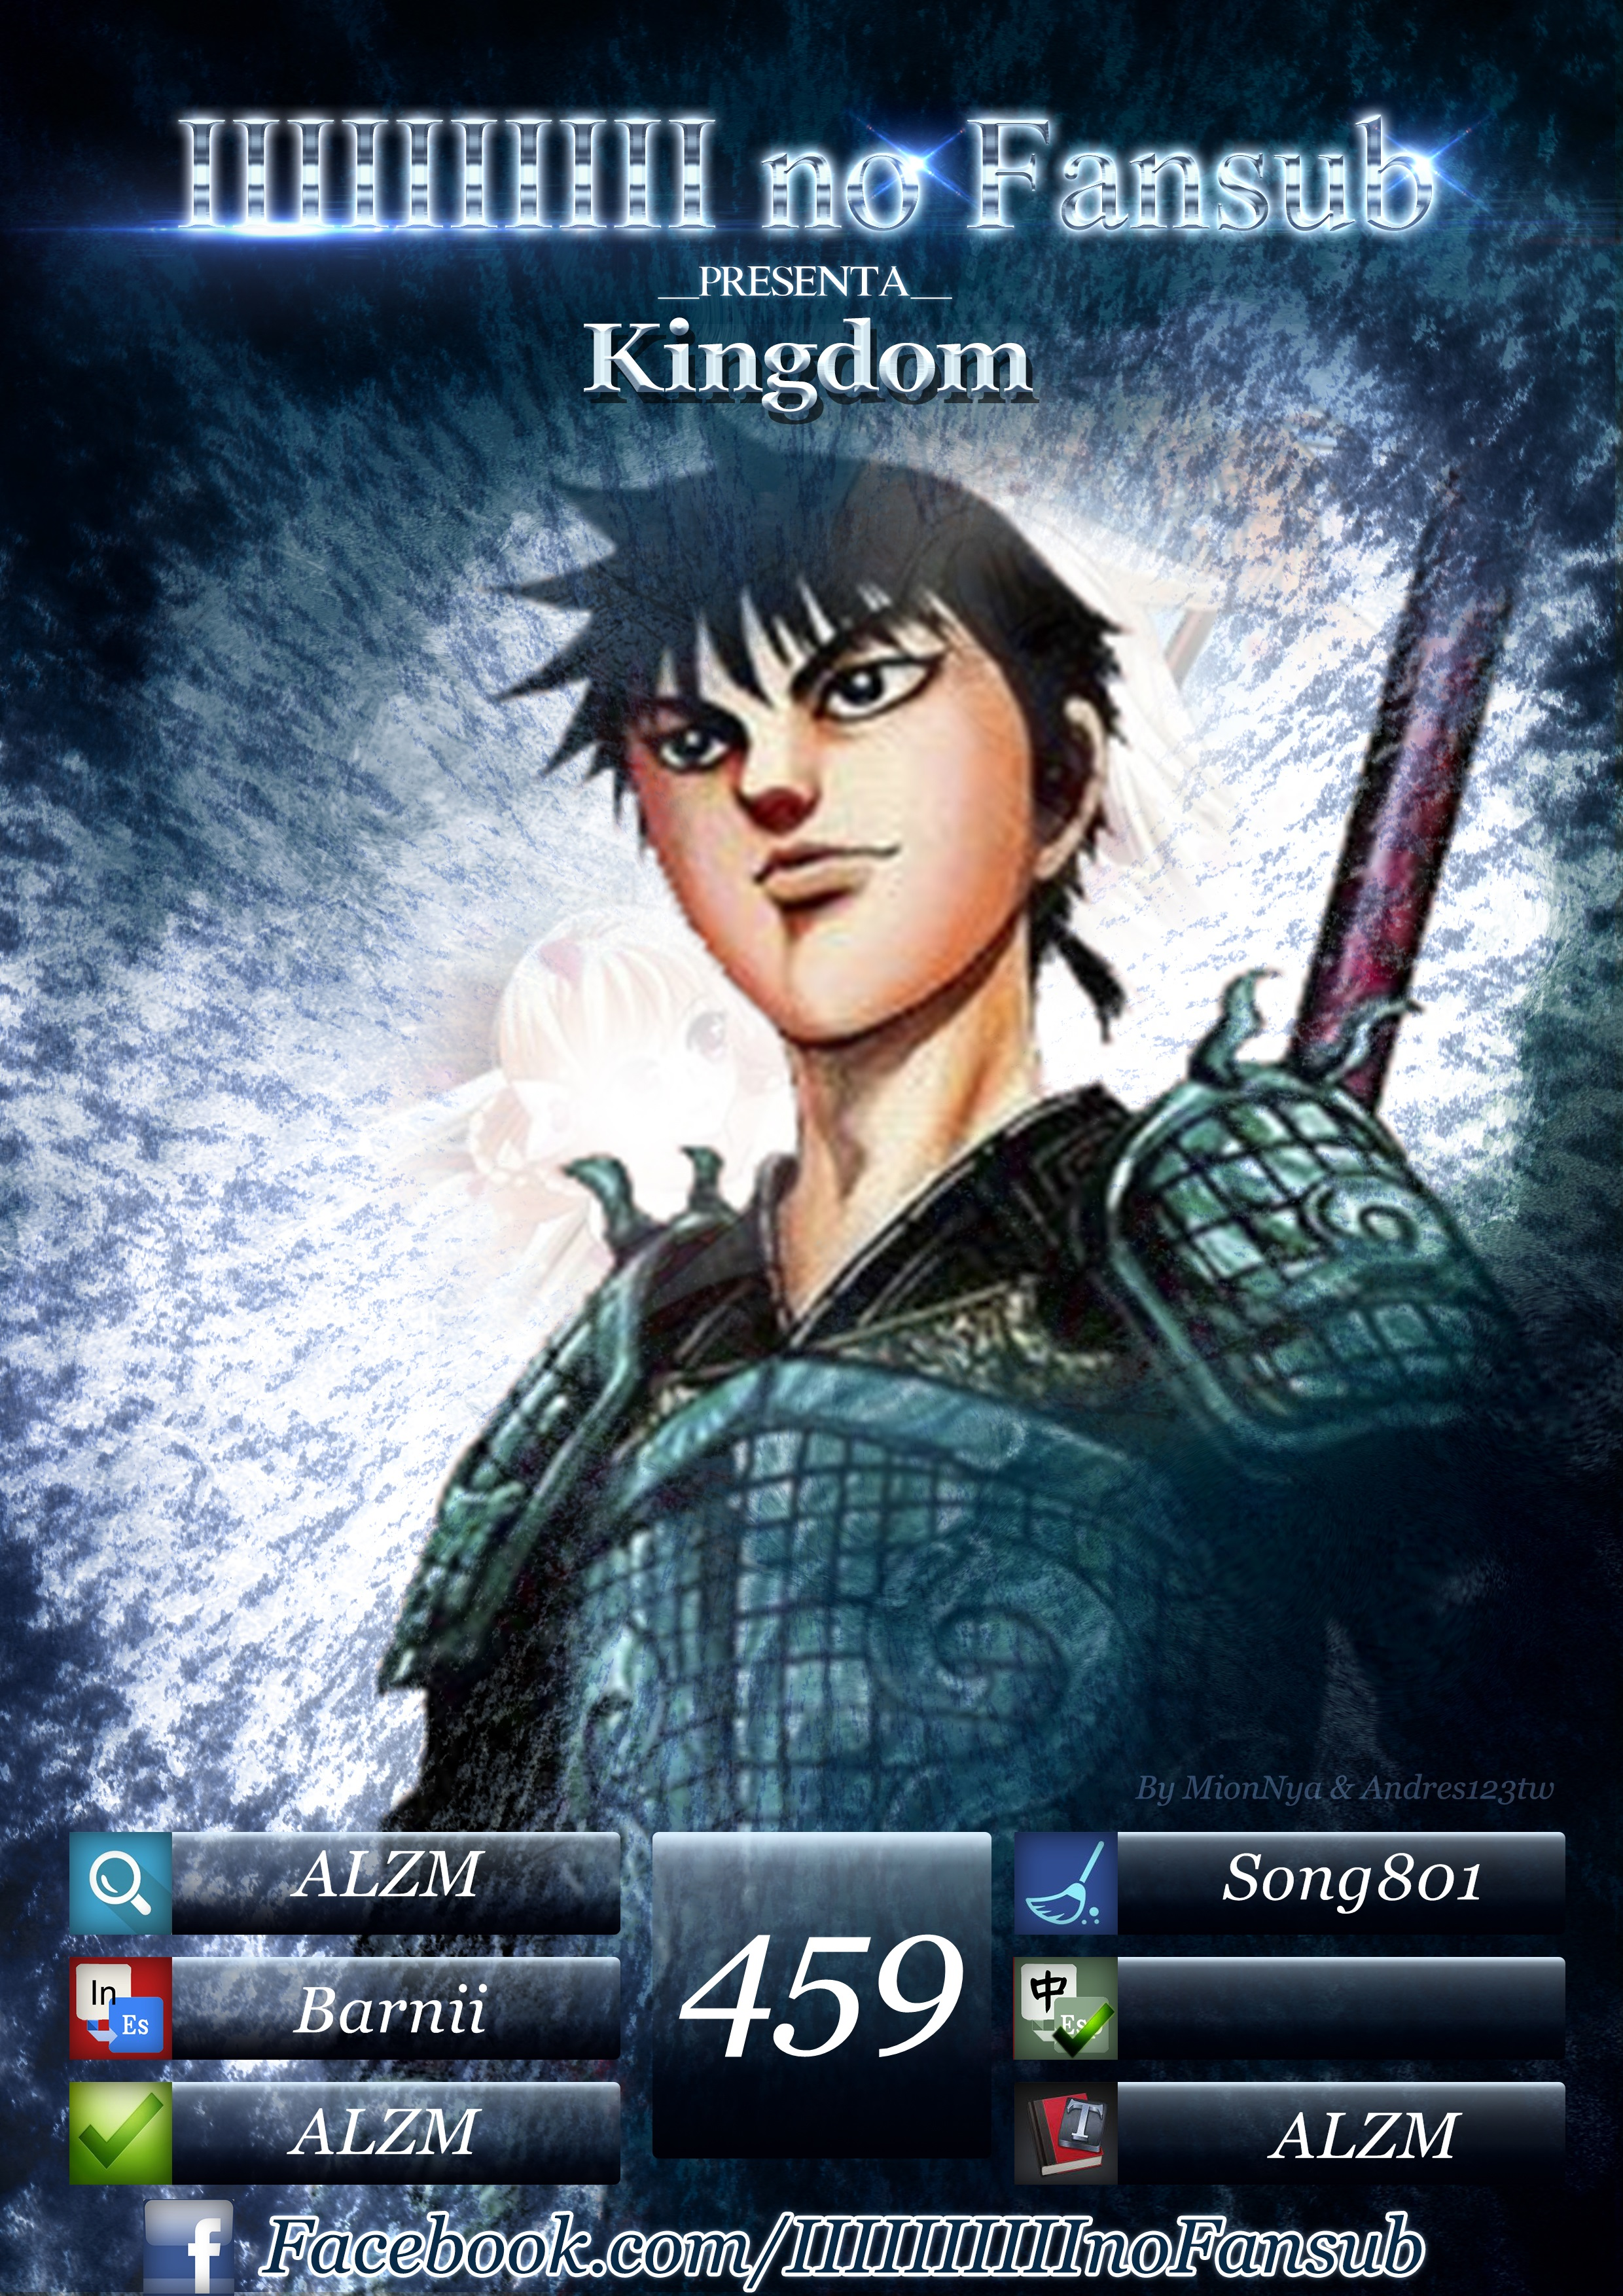 https://c5.ninemanga.com/es_manga/19/12307/437328/ff76ffce183c11f84489bbd0a34a2fcf.jpg Page 1